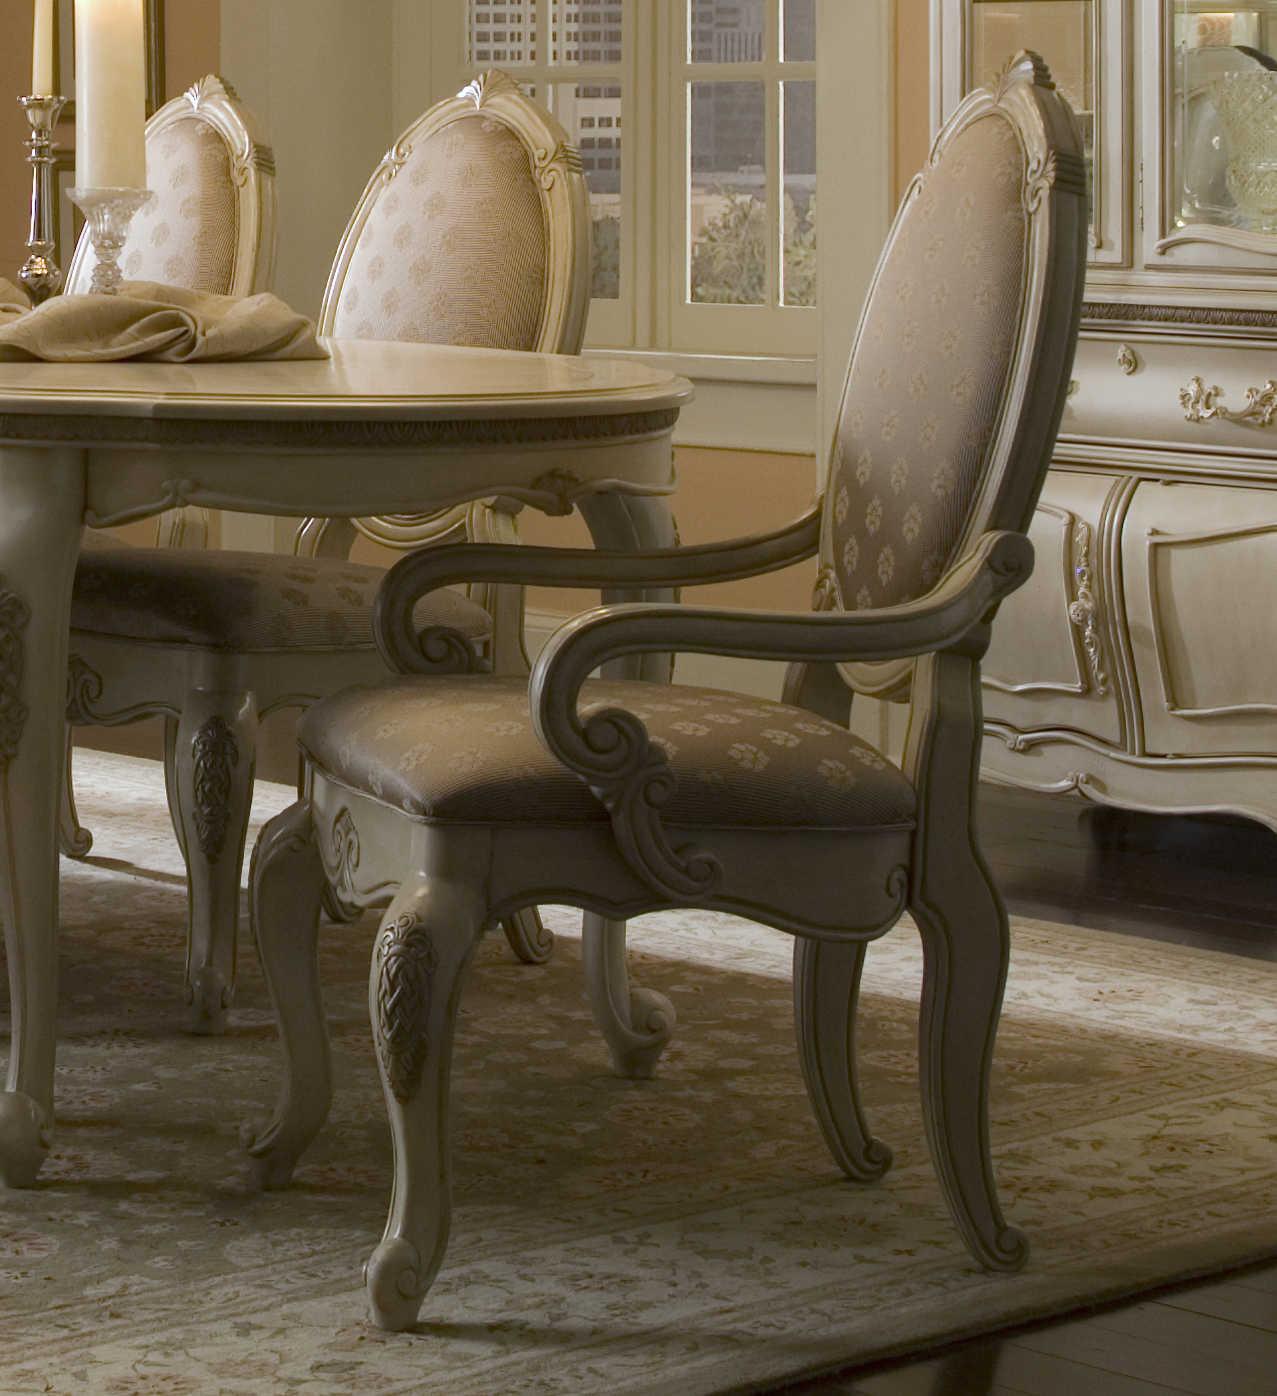 Aico Furniture Michael Amini Lavelle, Aico Dining Room Chairs